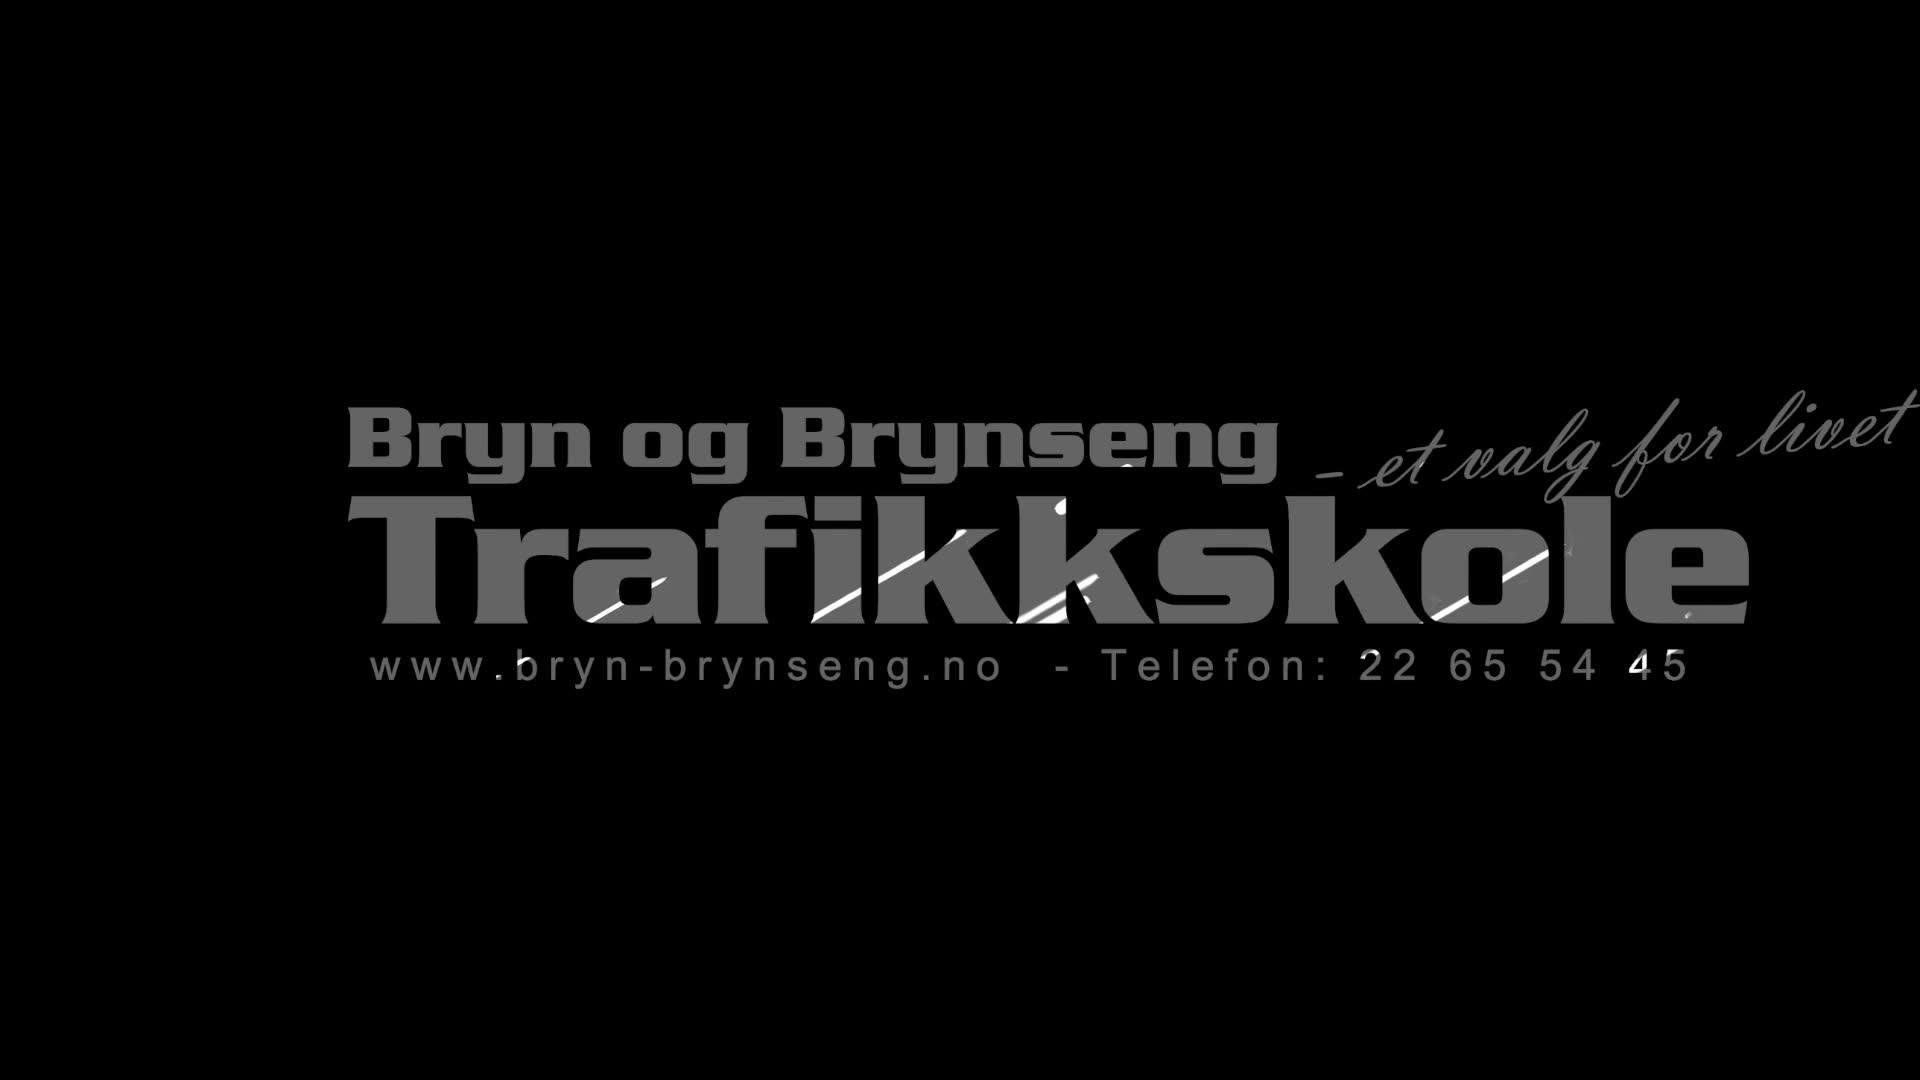 Bryn og Brynseng Trafikkskole